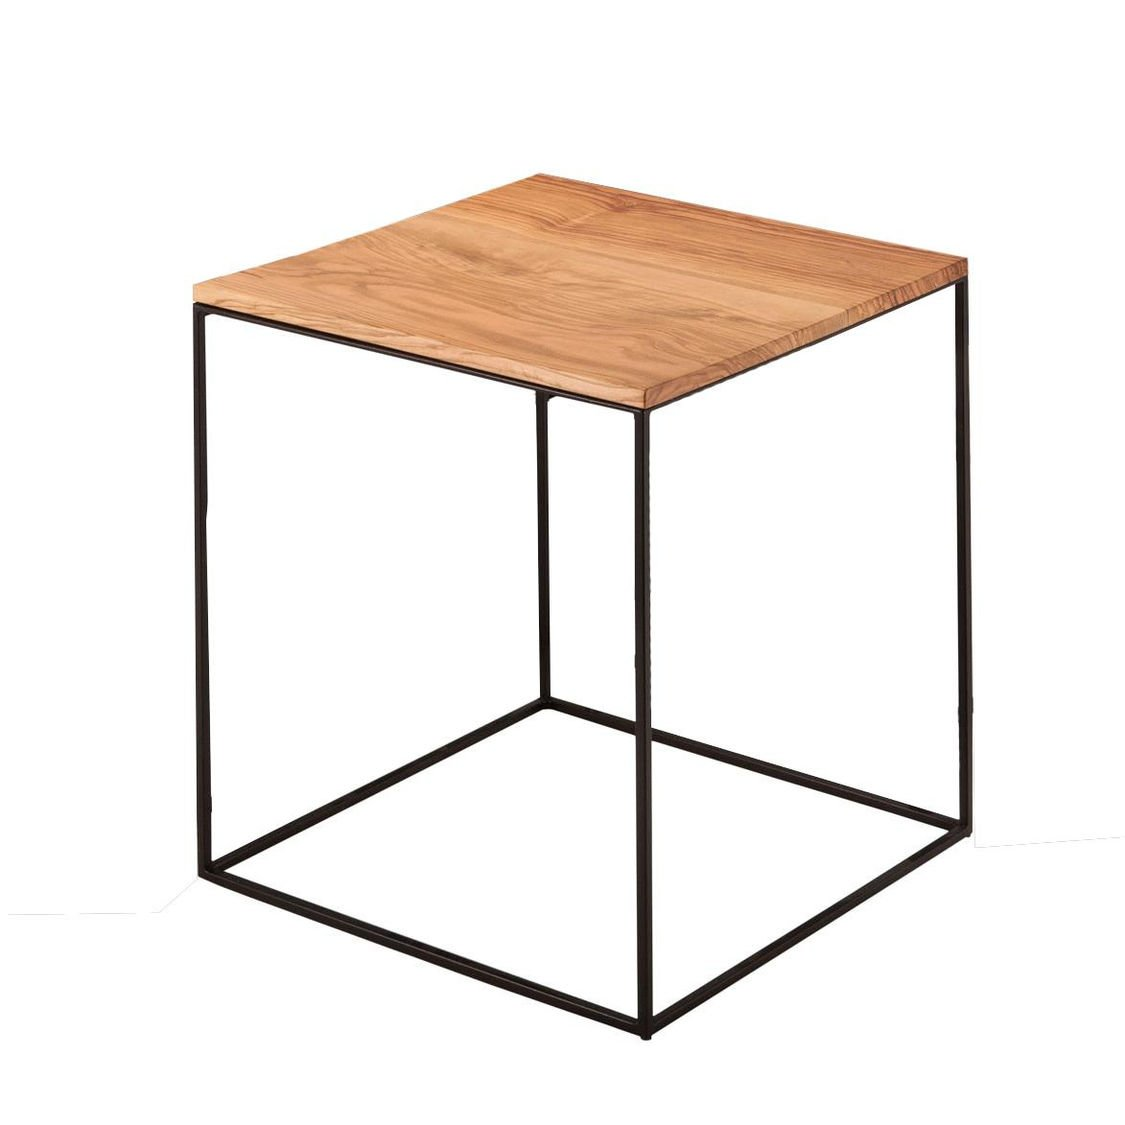 zeus slim irony side table 31x31cm ambientedirect. Black Bedroom Furniture Sets. Home Design Ideas